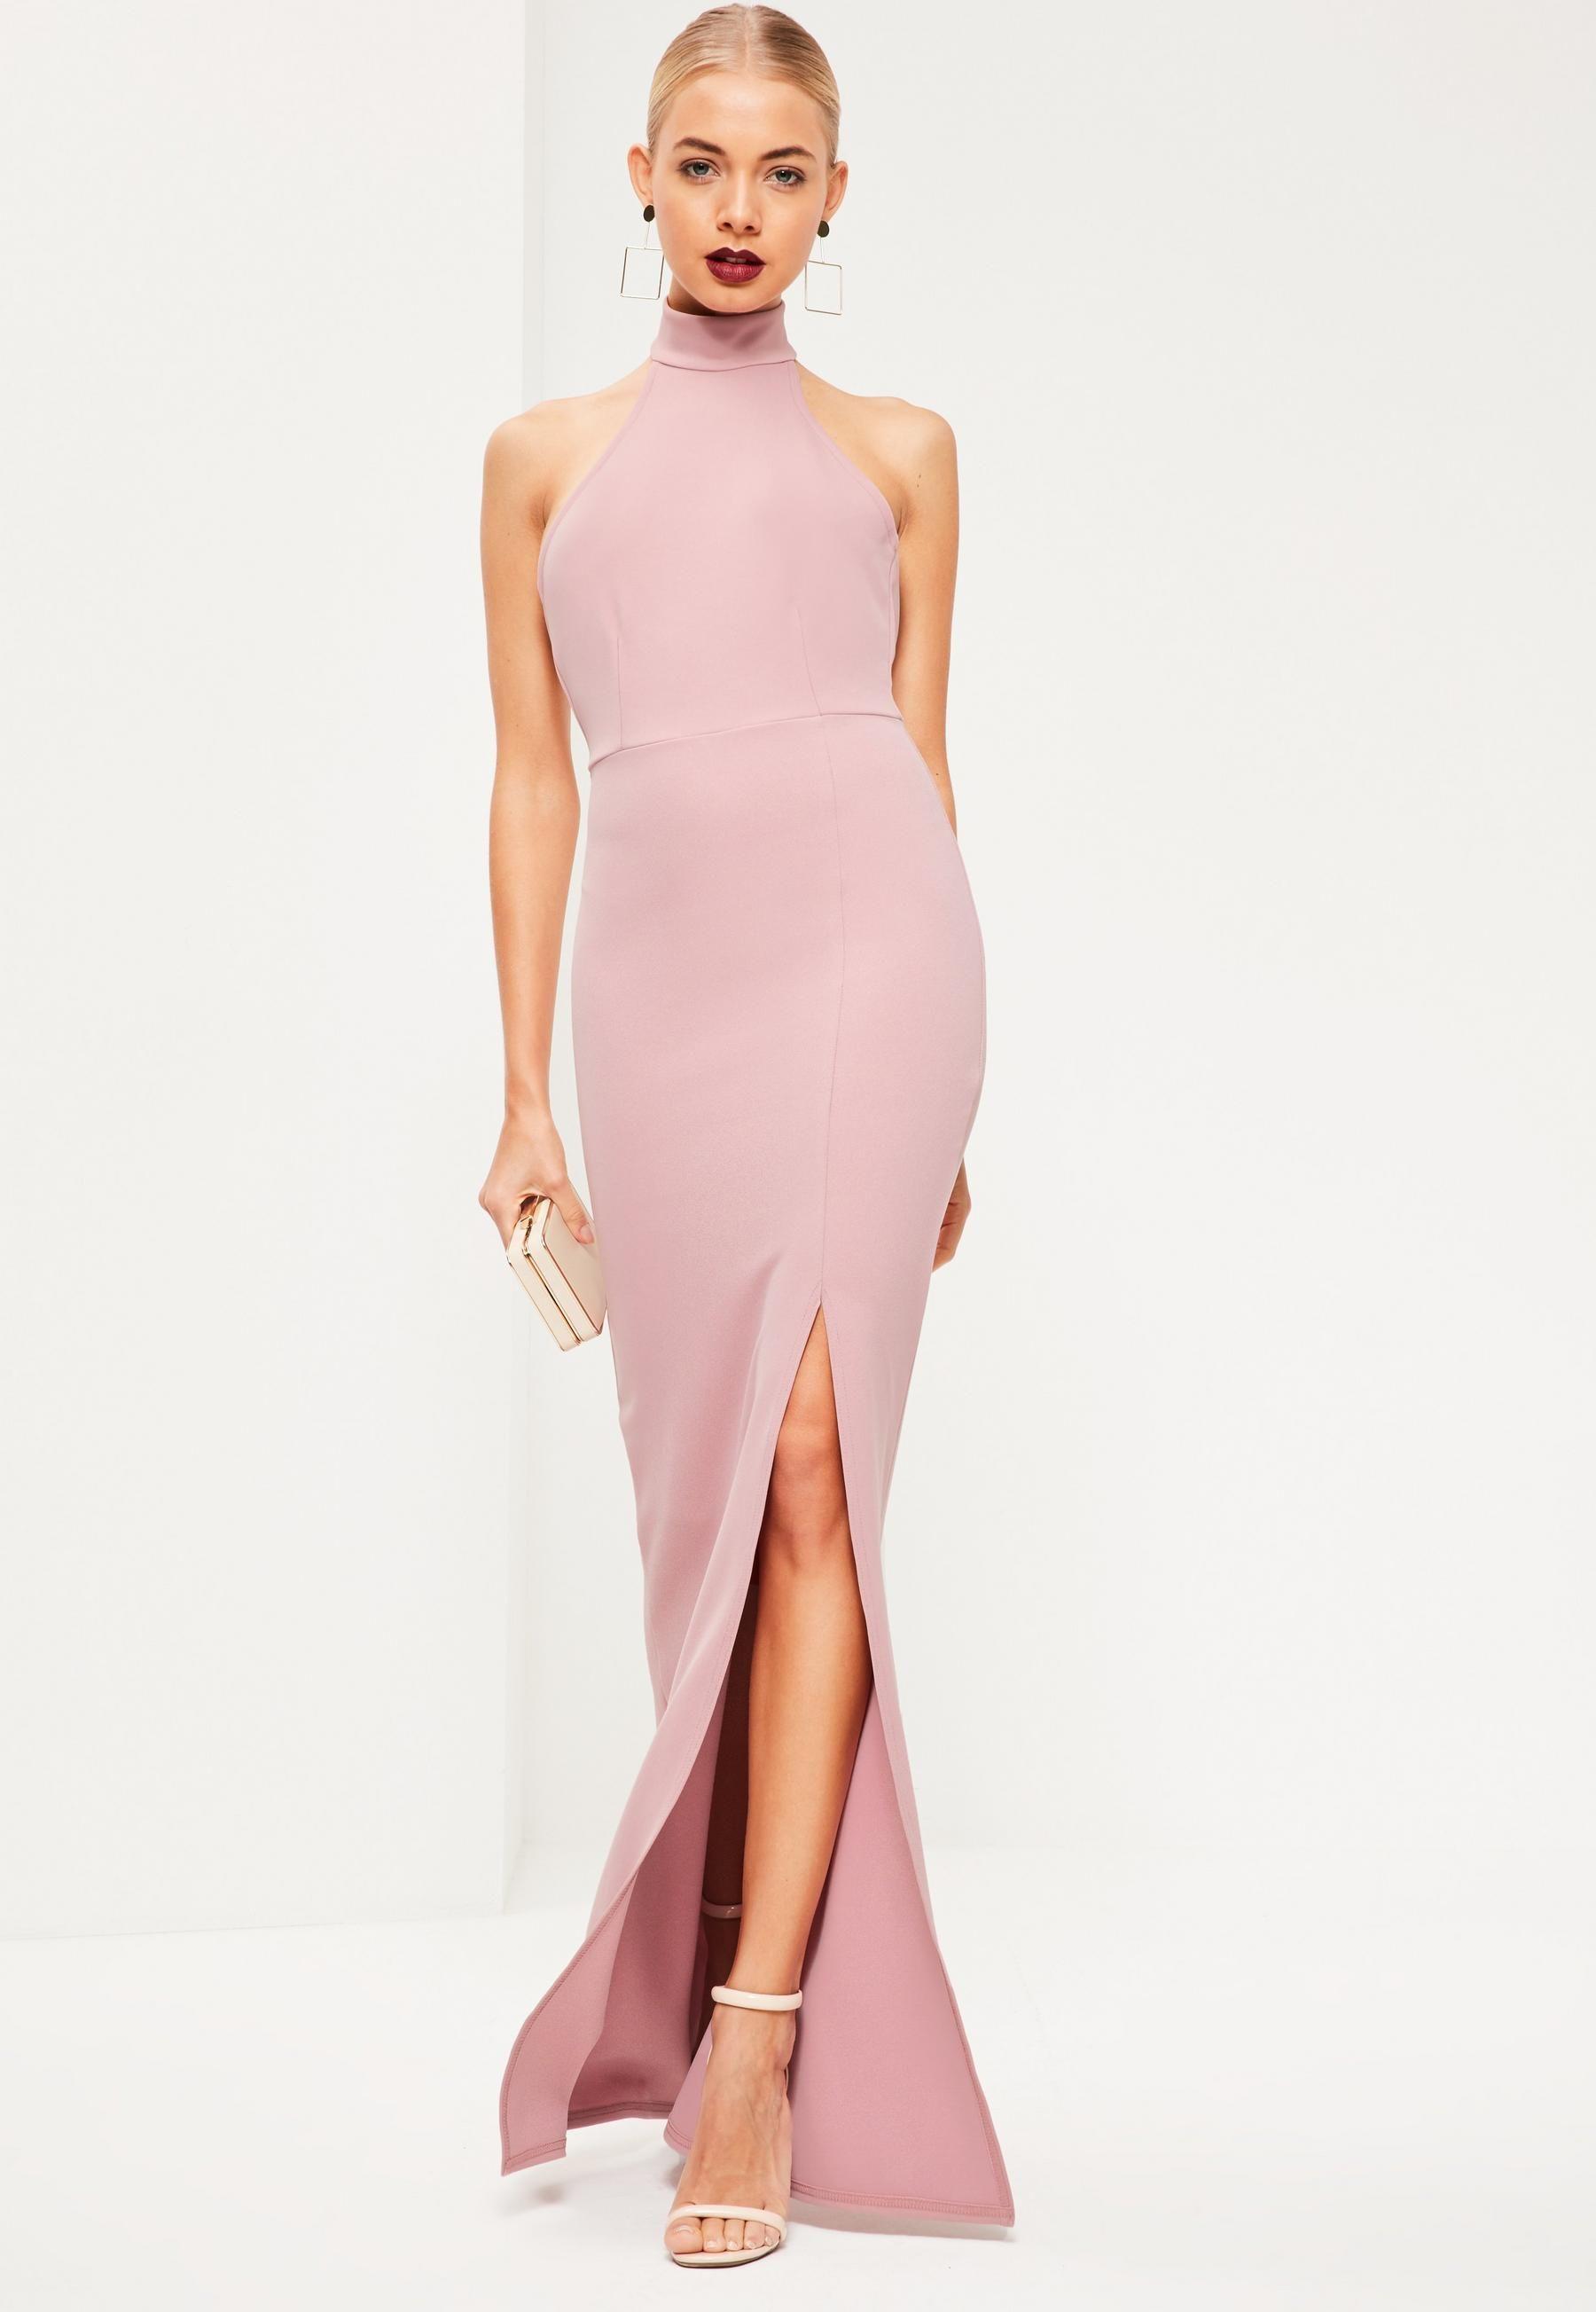 Missguided Pink Choker Maxi Dress